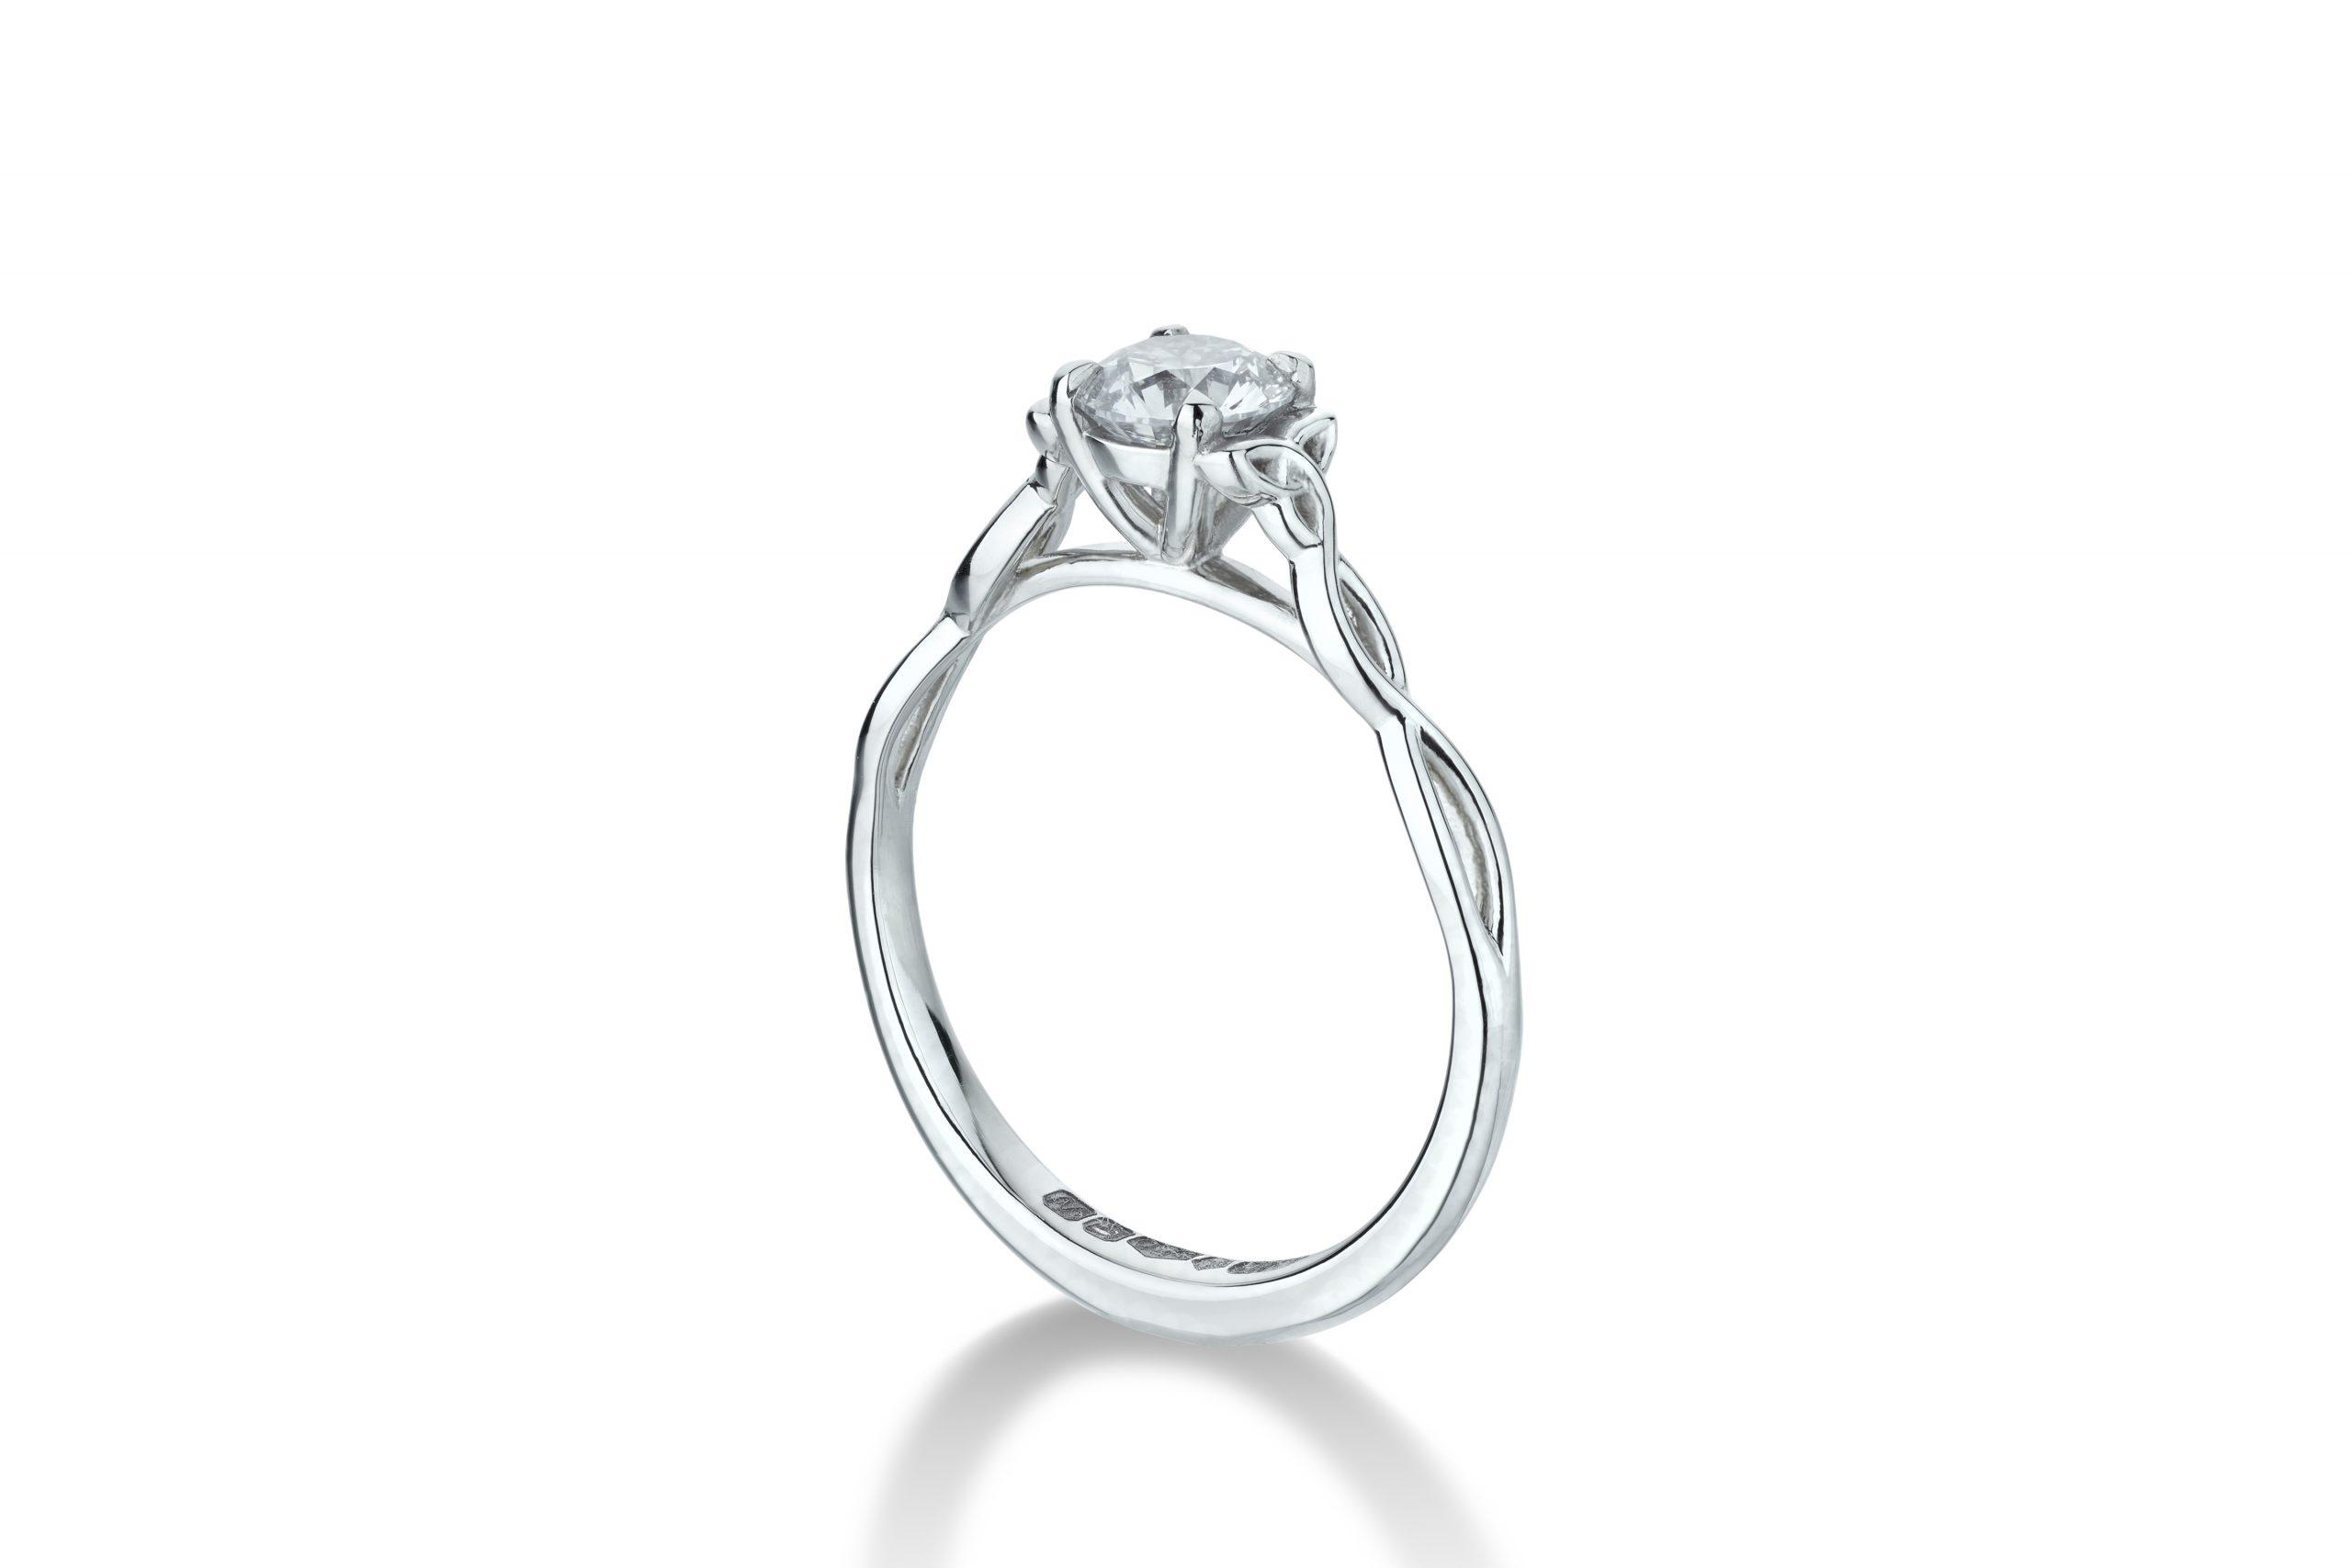 Celtic Knot Engagement Ring 2 – Copyright BJRdesigns